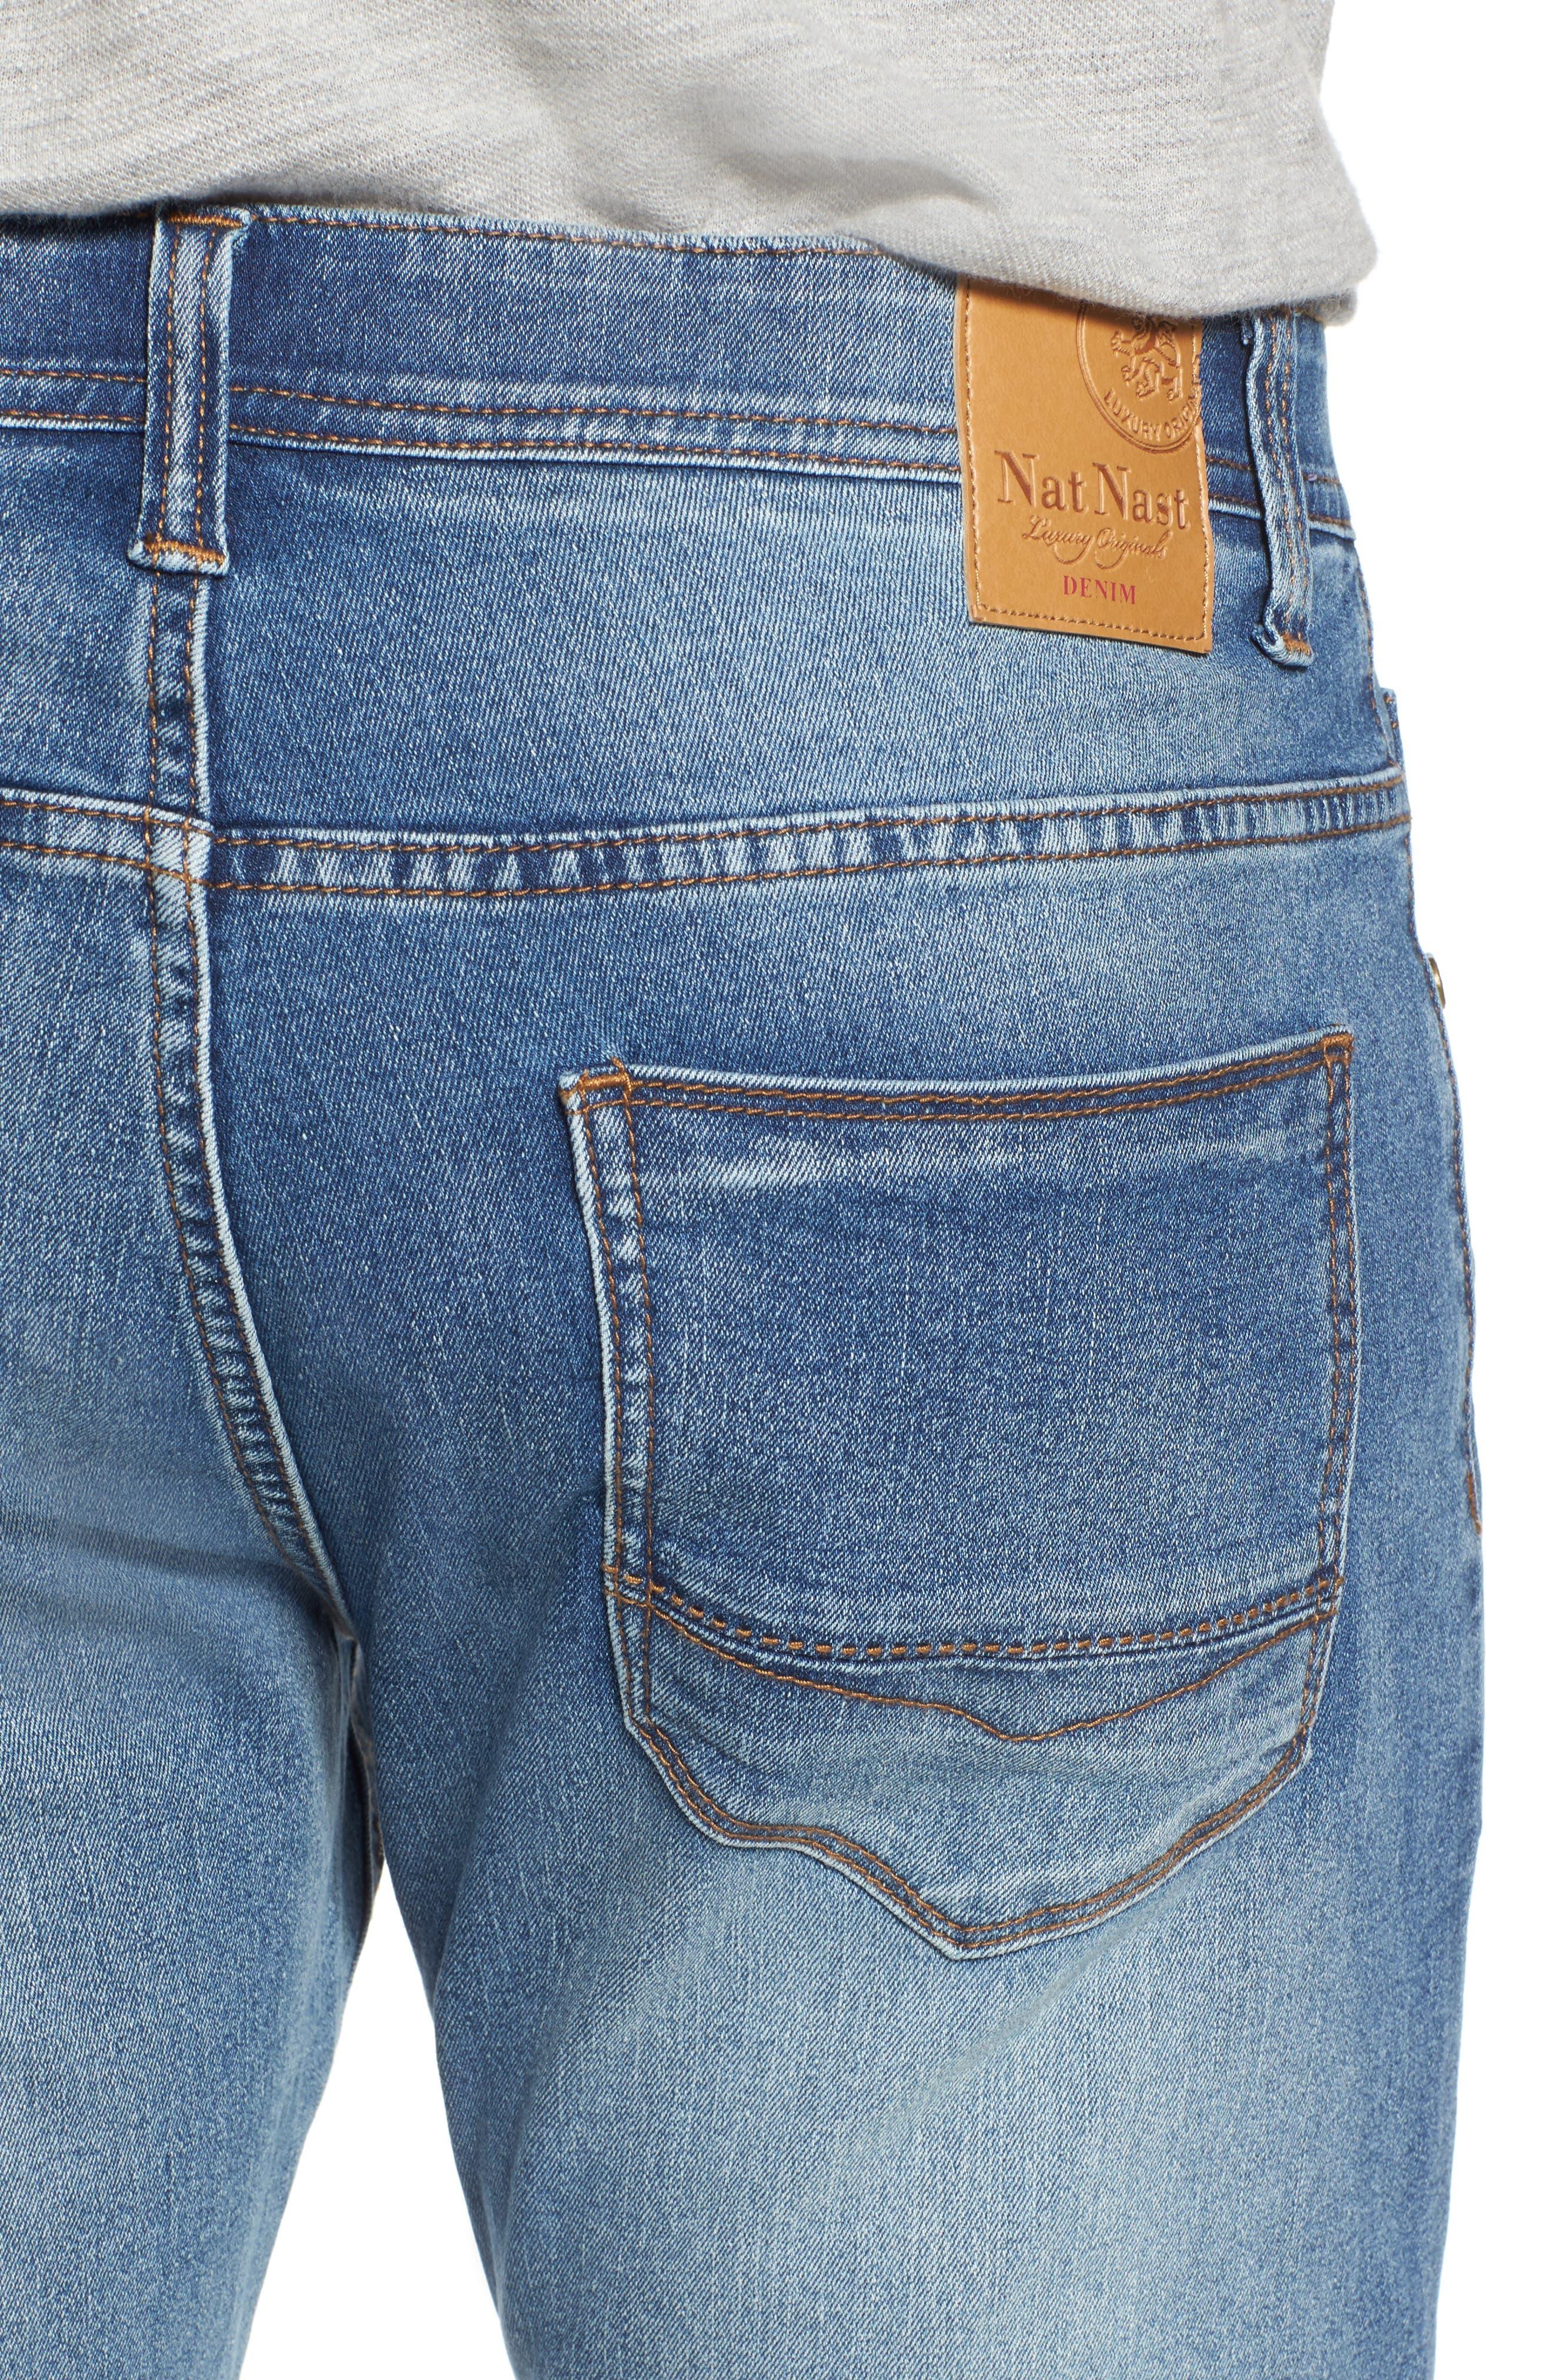 Maverick Stretch Slim Fit Jeans,                             Alternate thumbnail 4, color,                             Beach Wash